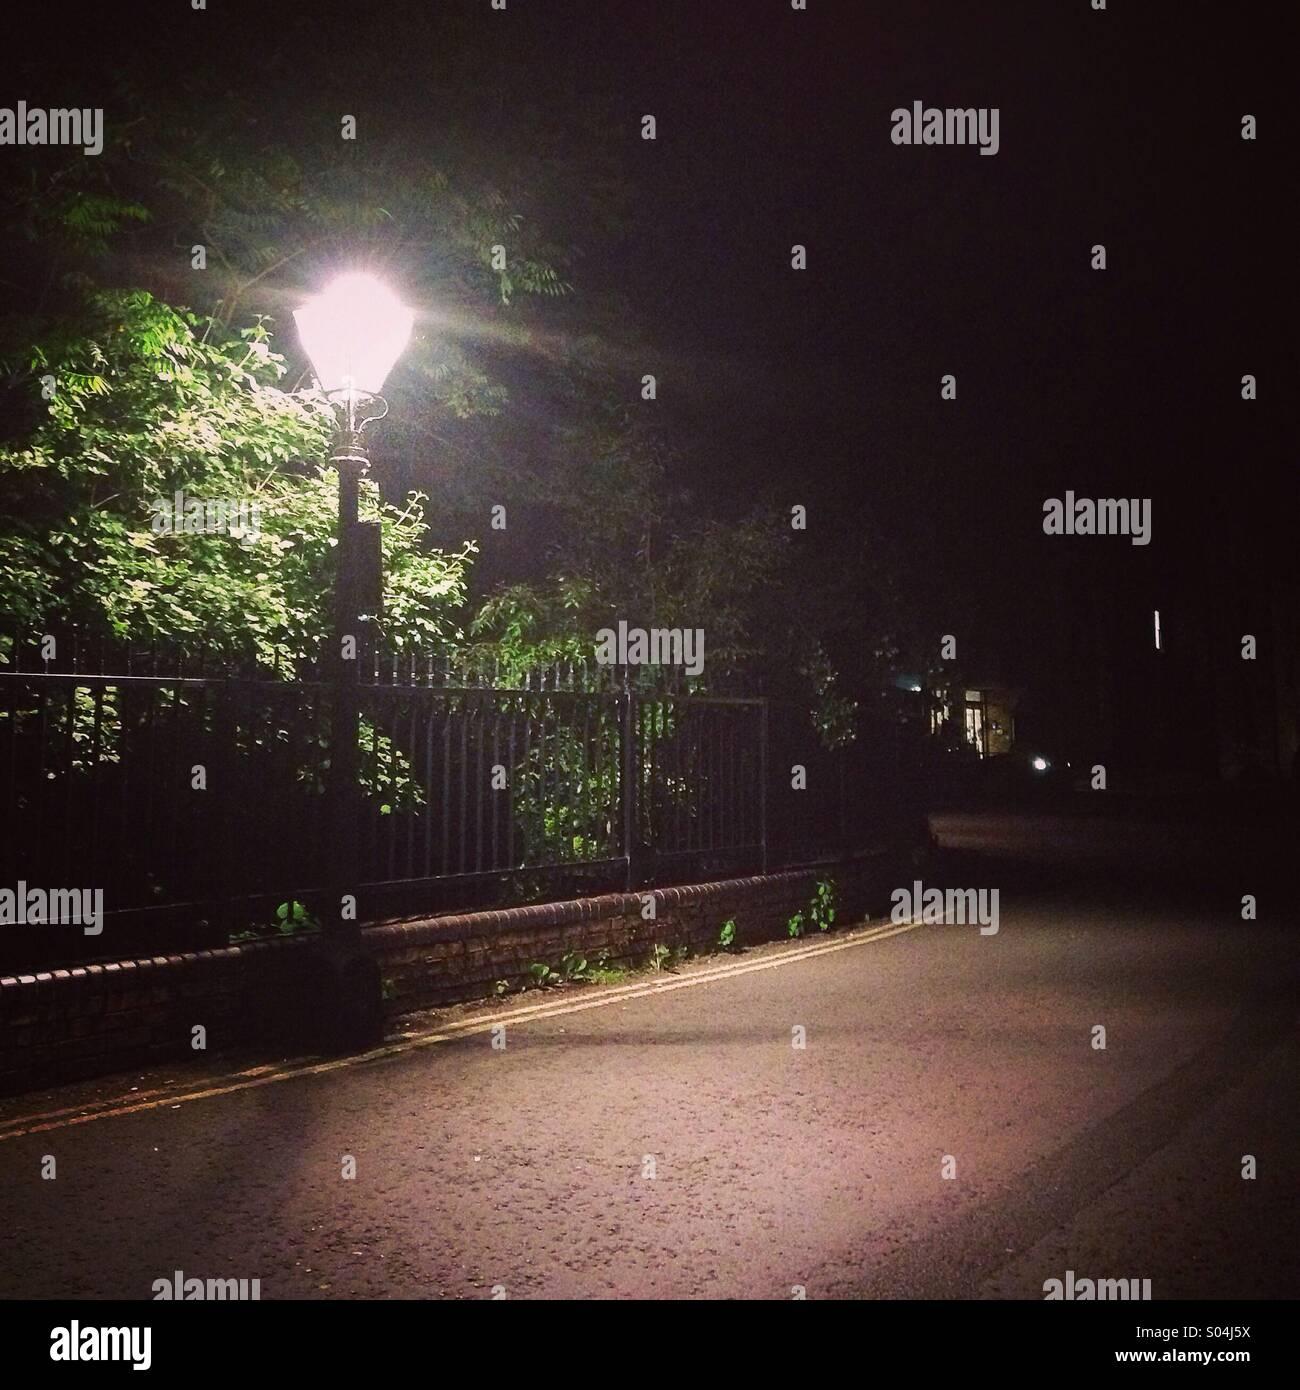 Nighttime street scene - Stock Image